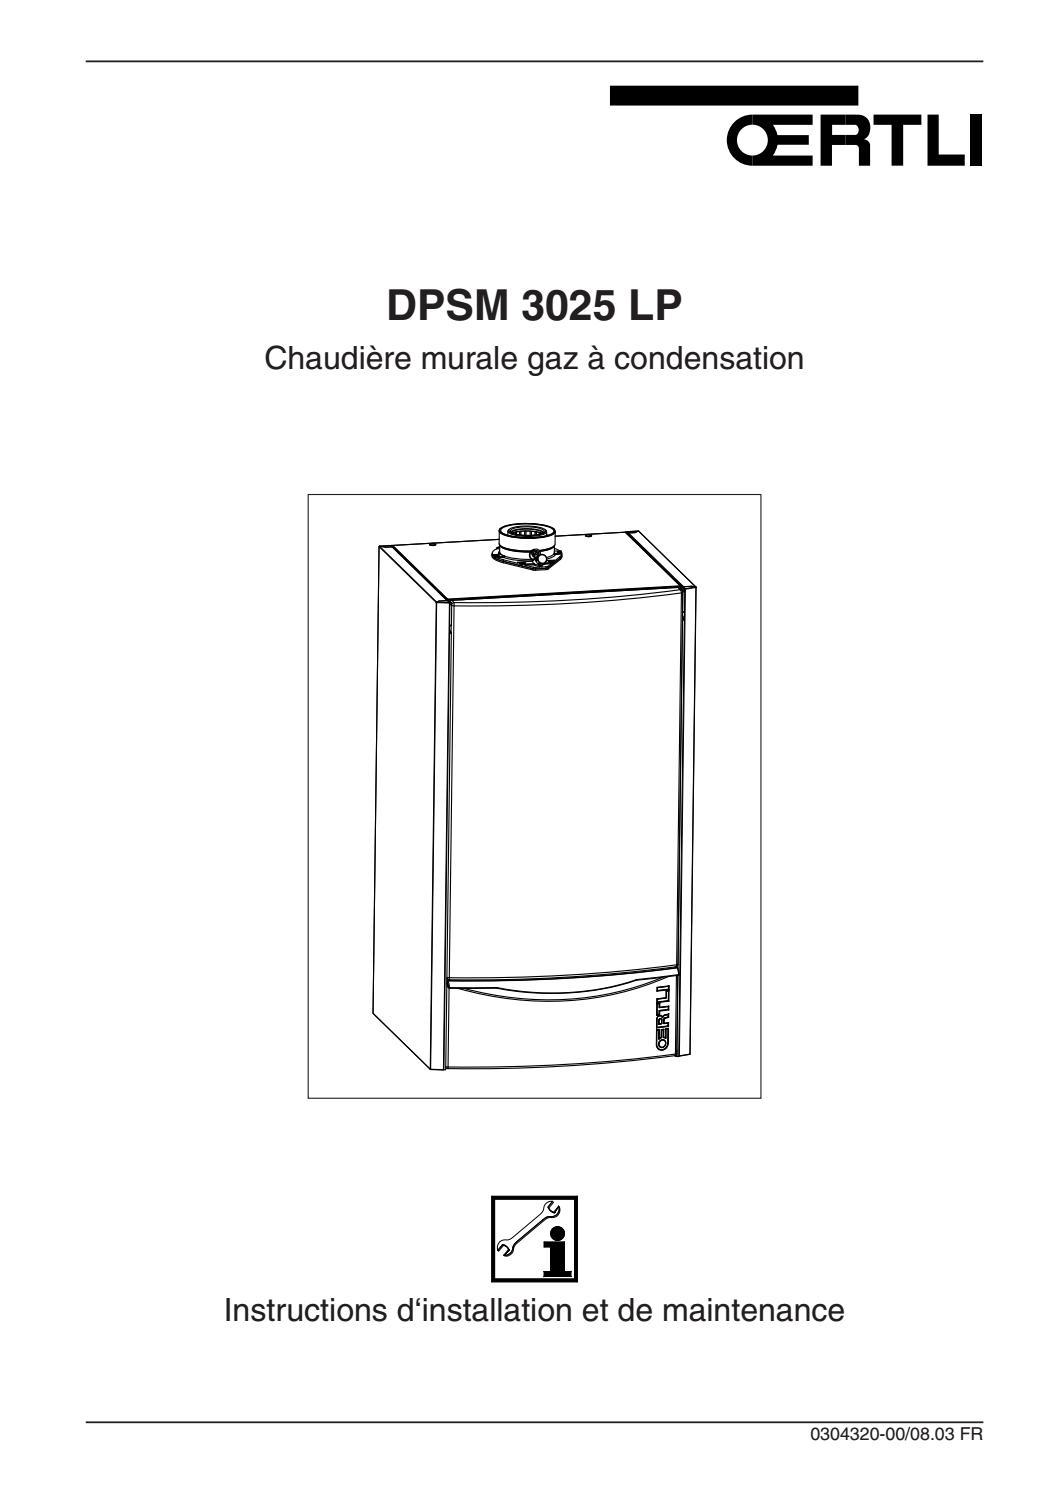 Installation Chaudière À Condensation oertli chaudiere gaz condensation dpsm 3025 lp notice